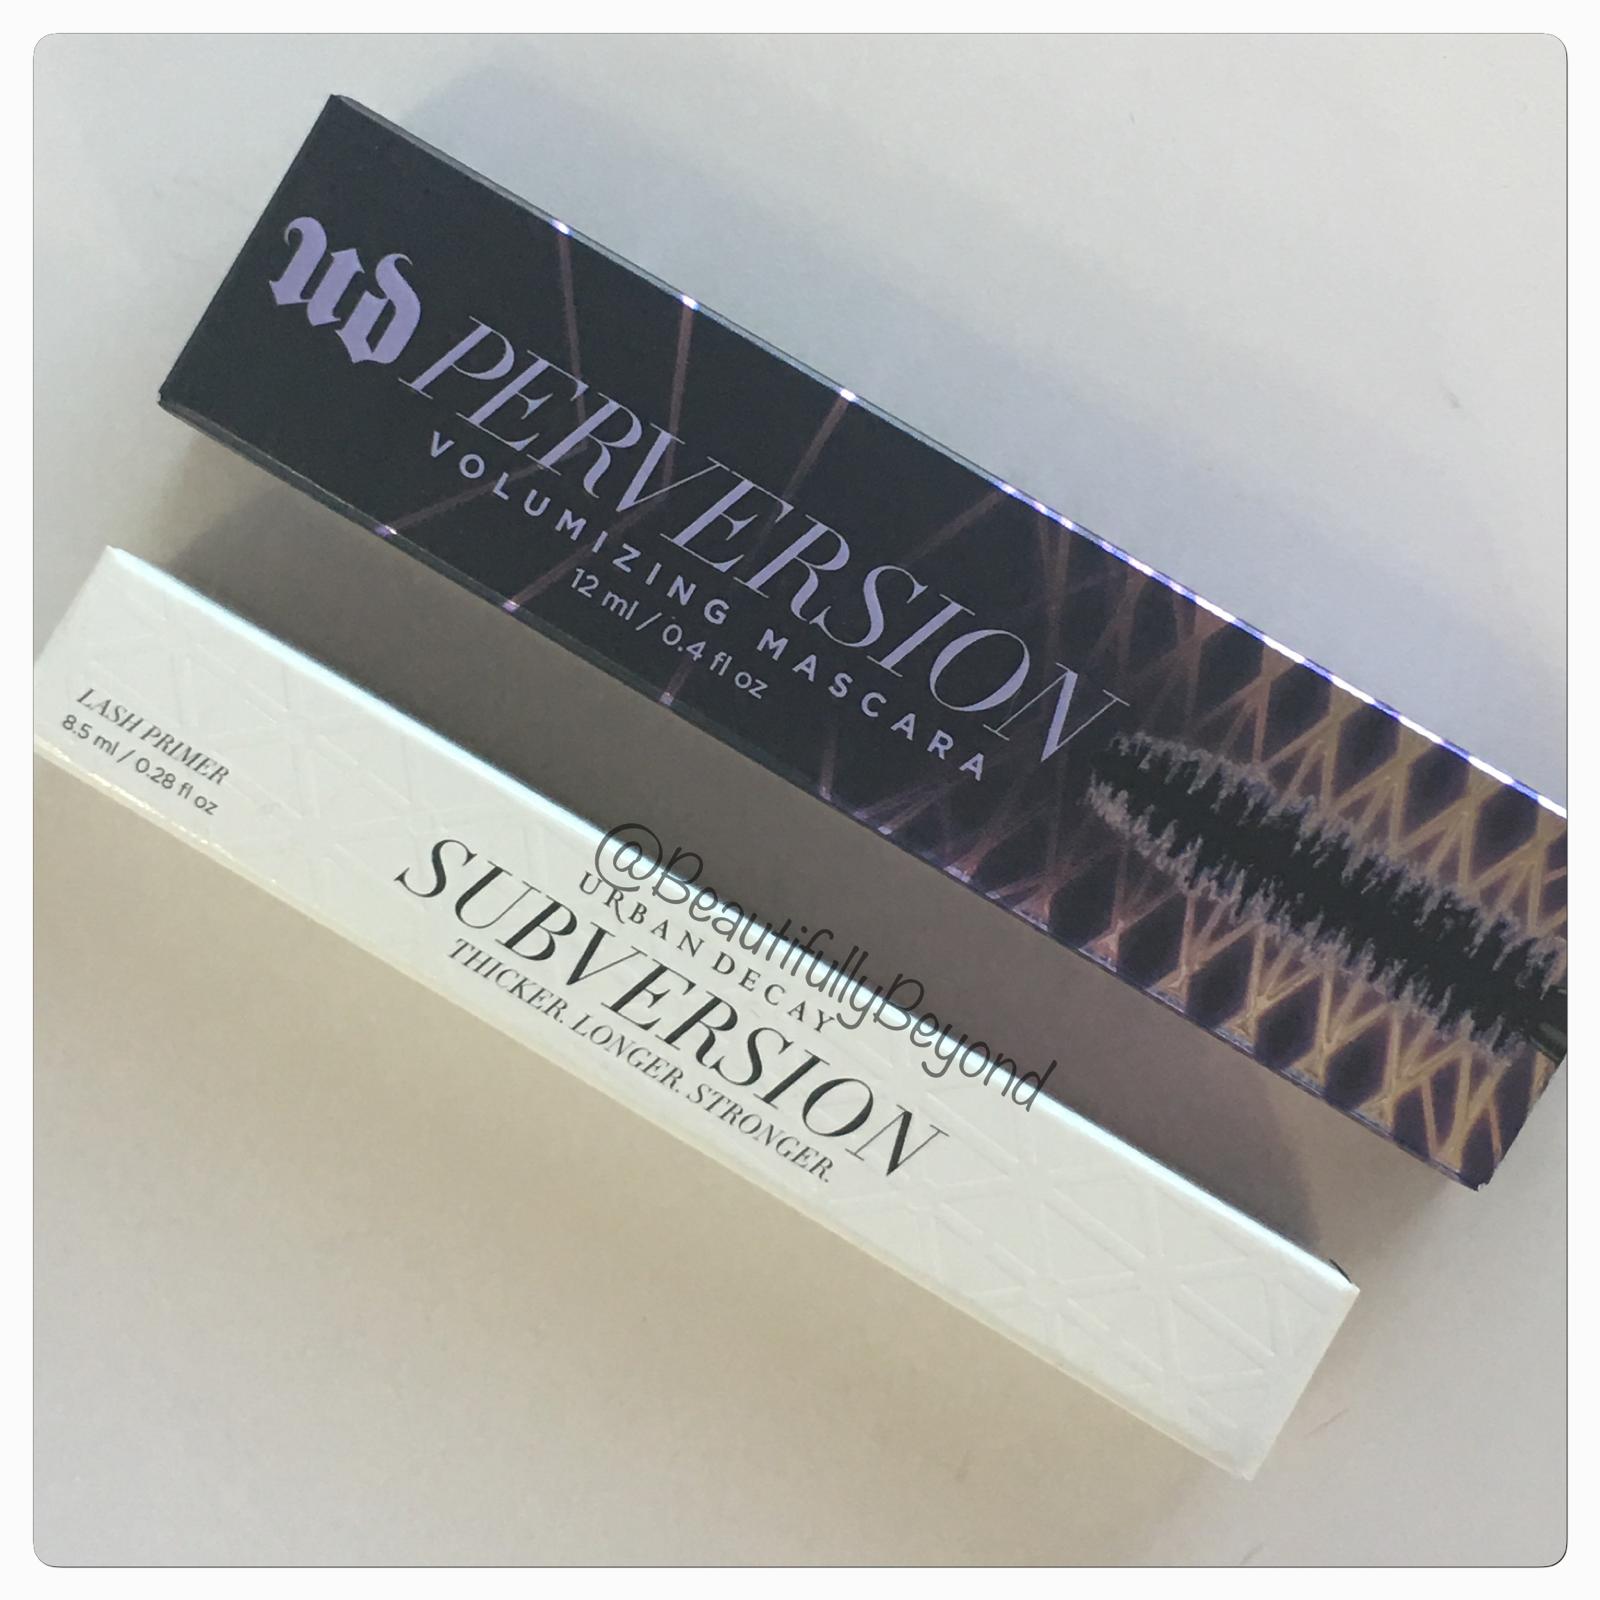 de390ea2d2b Urban Decay Perversion Black Mascara - 12ml for sale online | eBay